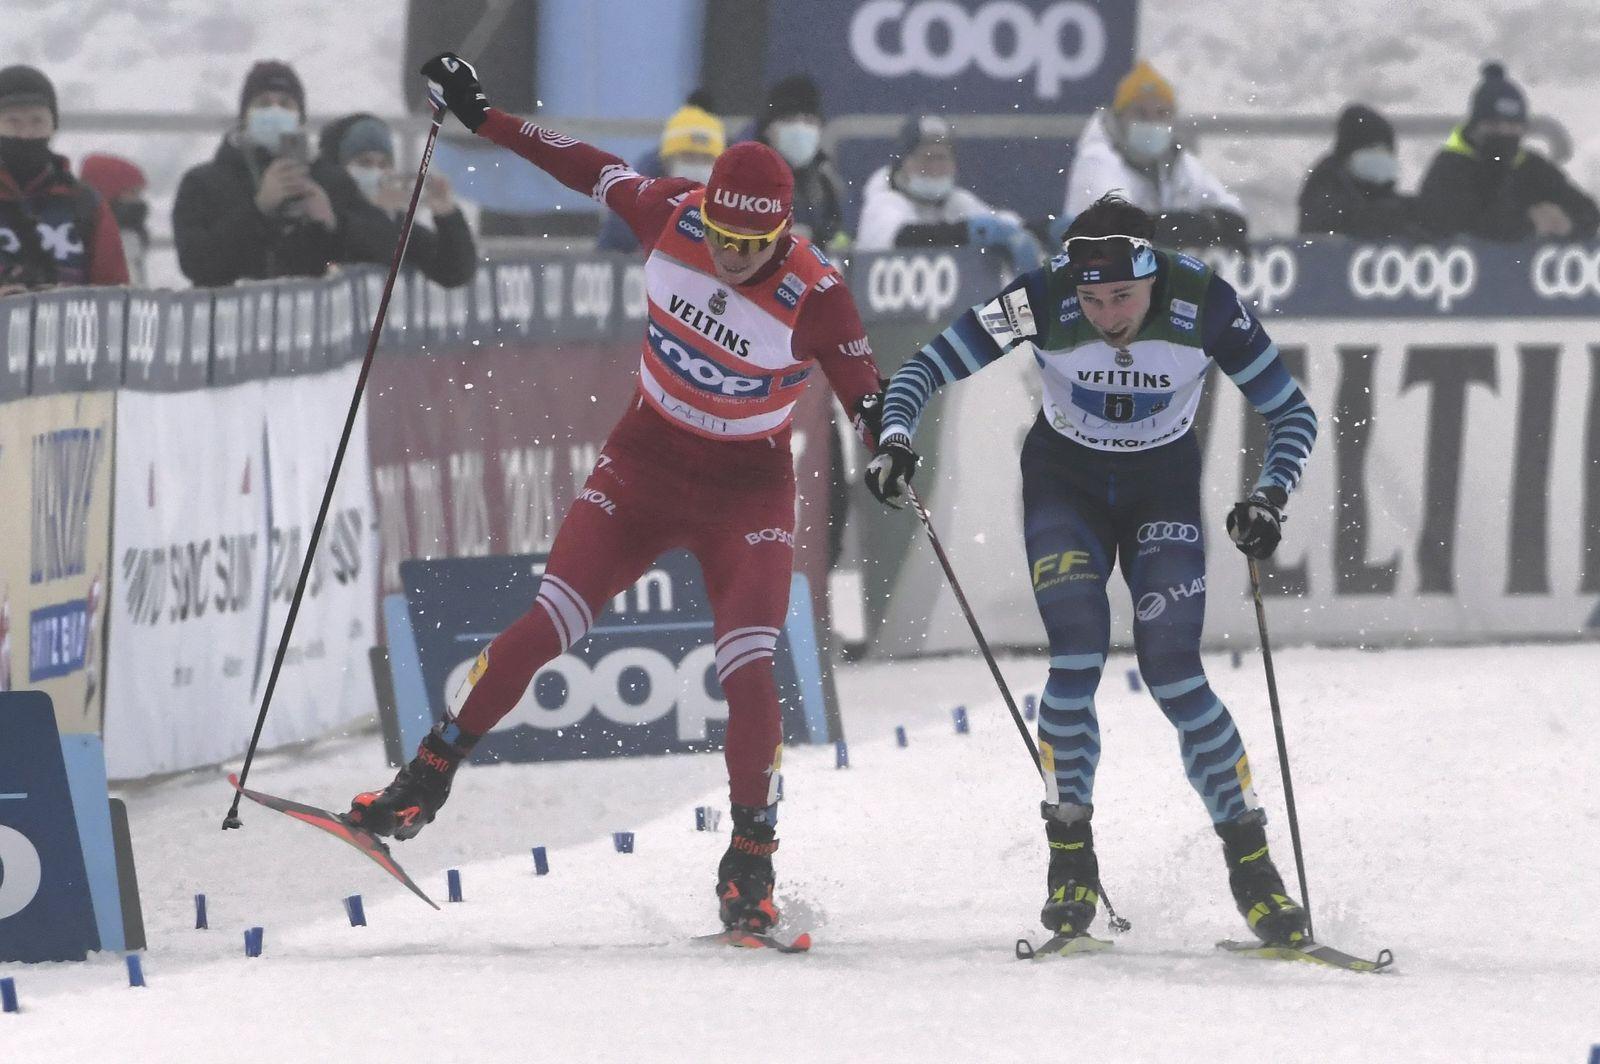 Skilanglauf-Weltcup in Lahti